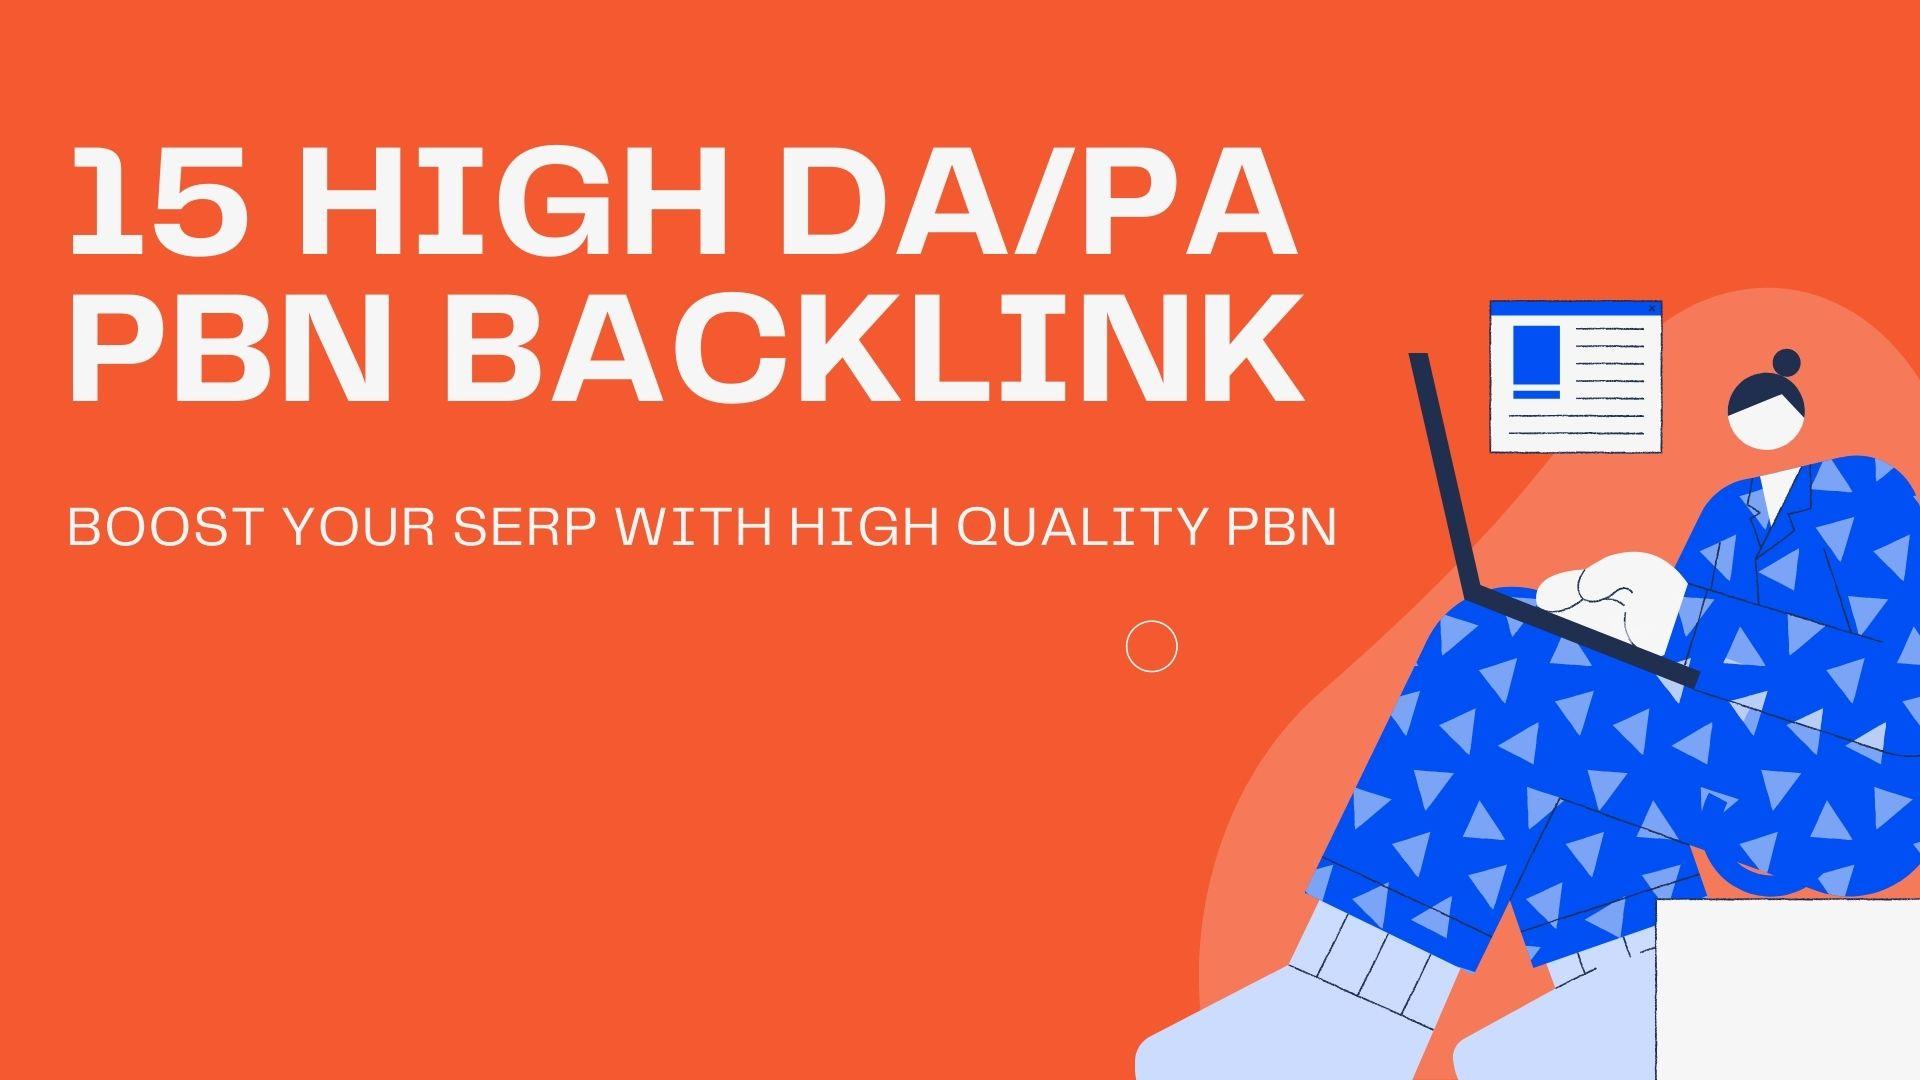 Build 15 HIGH DA PA Dofollow PBN Backlinks - Boost Your SERP